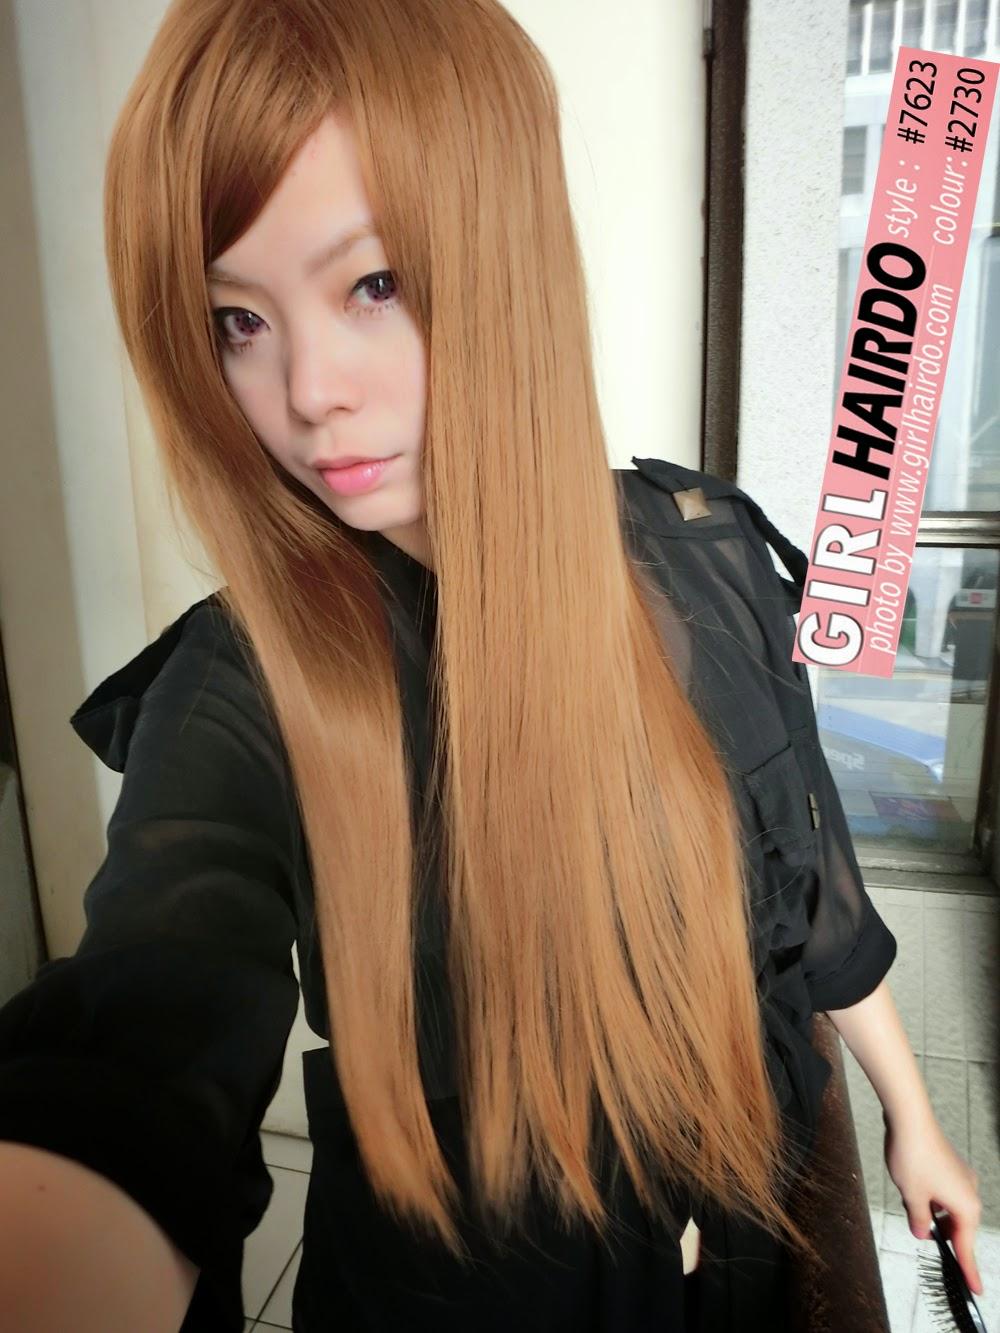 http://4.bp.blogspot.com/-7bCsJ_hwlcA/Uunao-yTUuI/AAAAAAAARG4/GQPPo70HrBY/s1600/CIMG0039.JPG